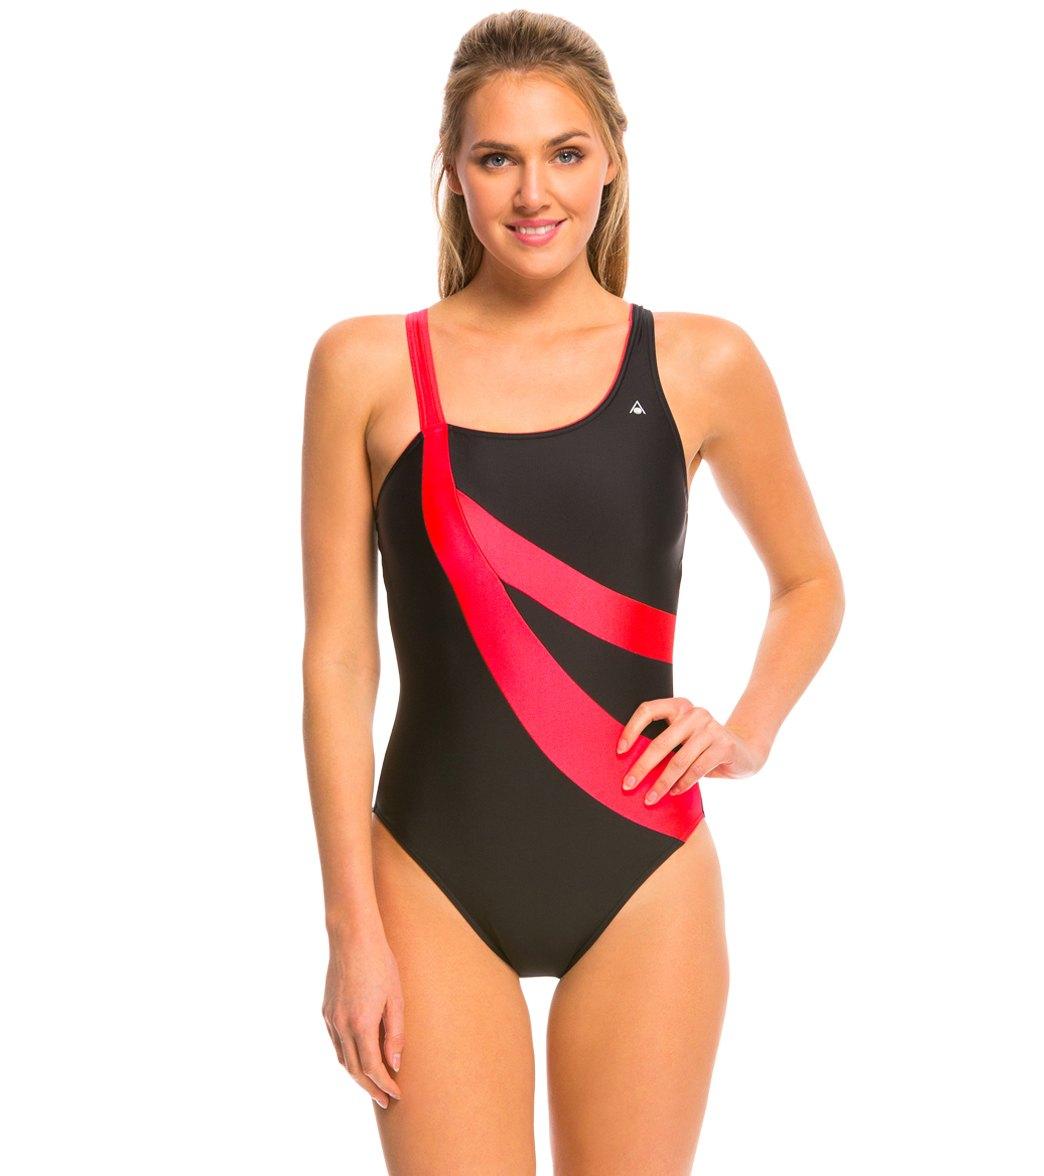 b7378f3124 Aqua Sphere Sahara One Piece Swimsuit at SwimOutlet.com - Free Shipping